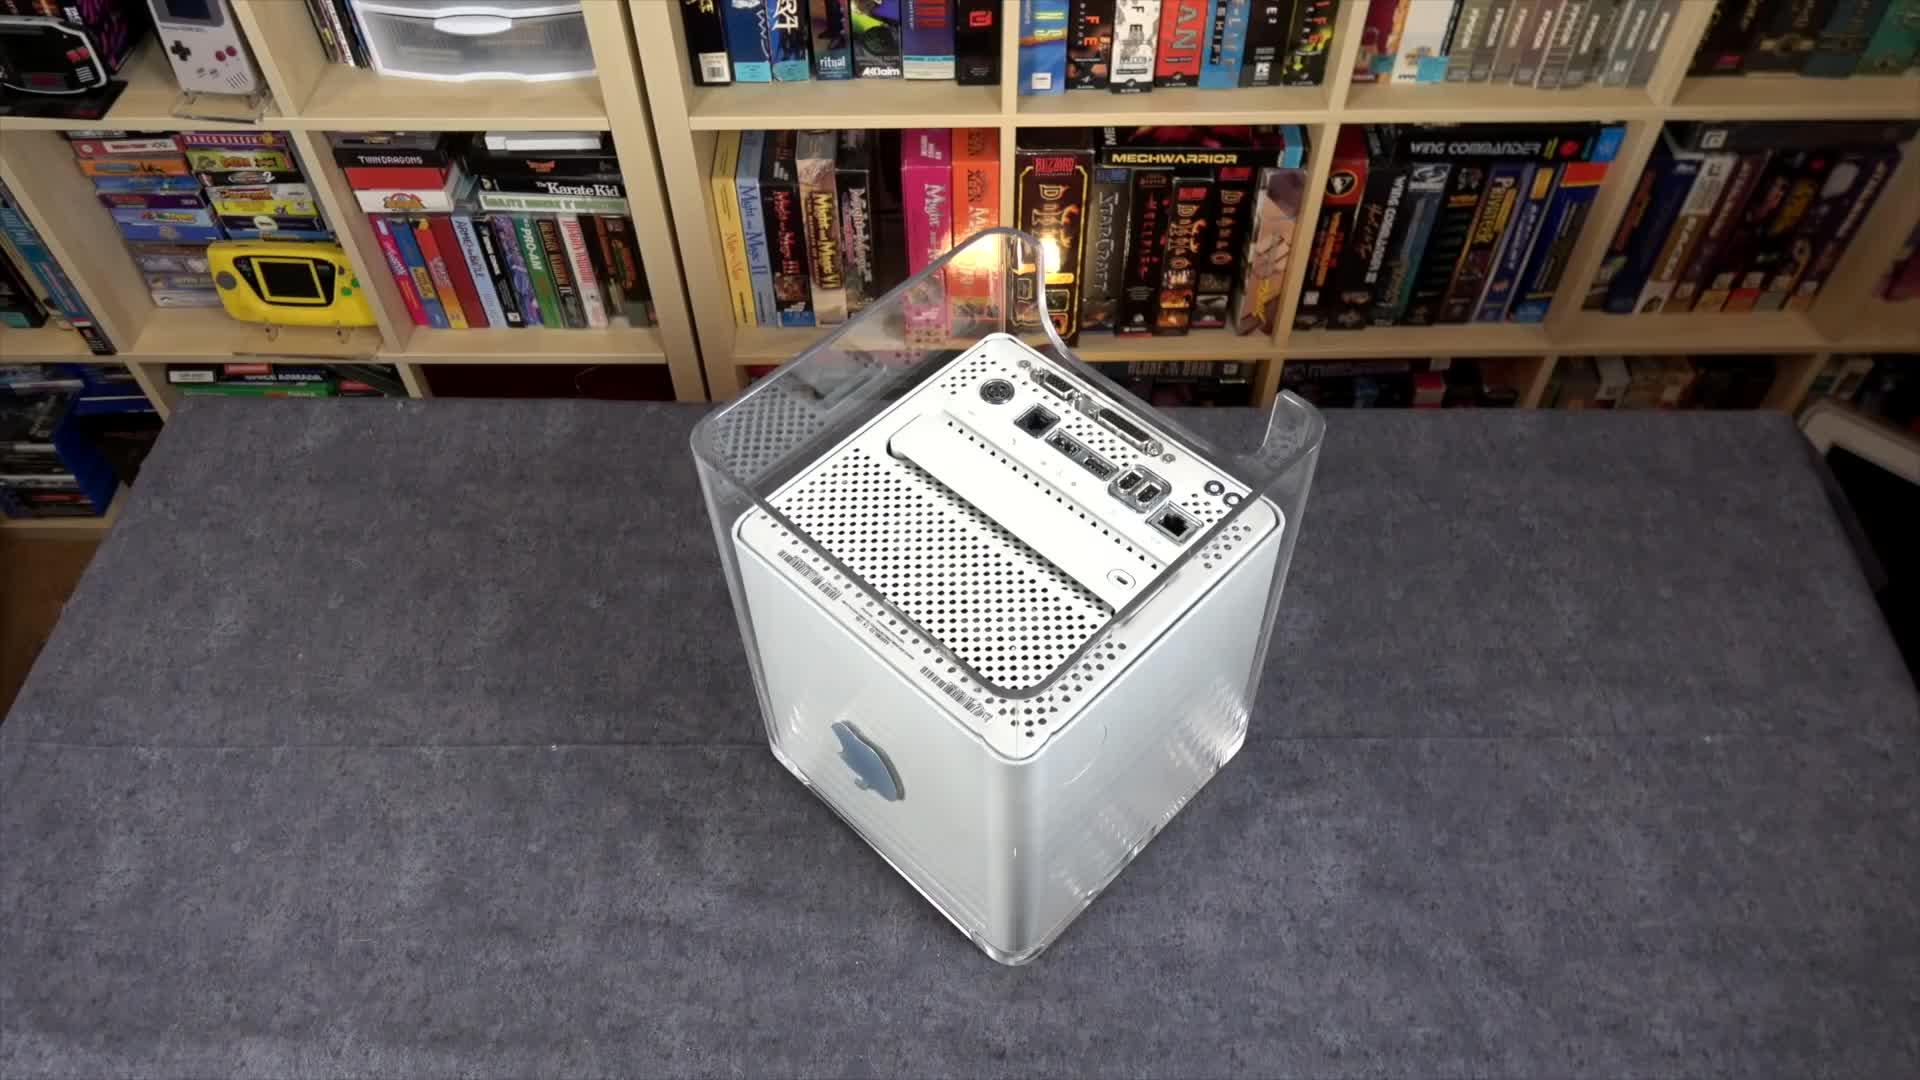 Power Mac G4 Cube upgrade GIFs